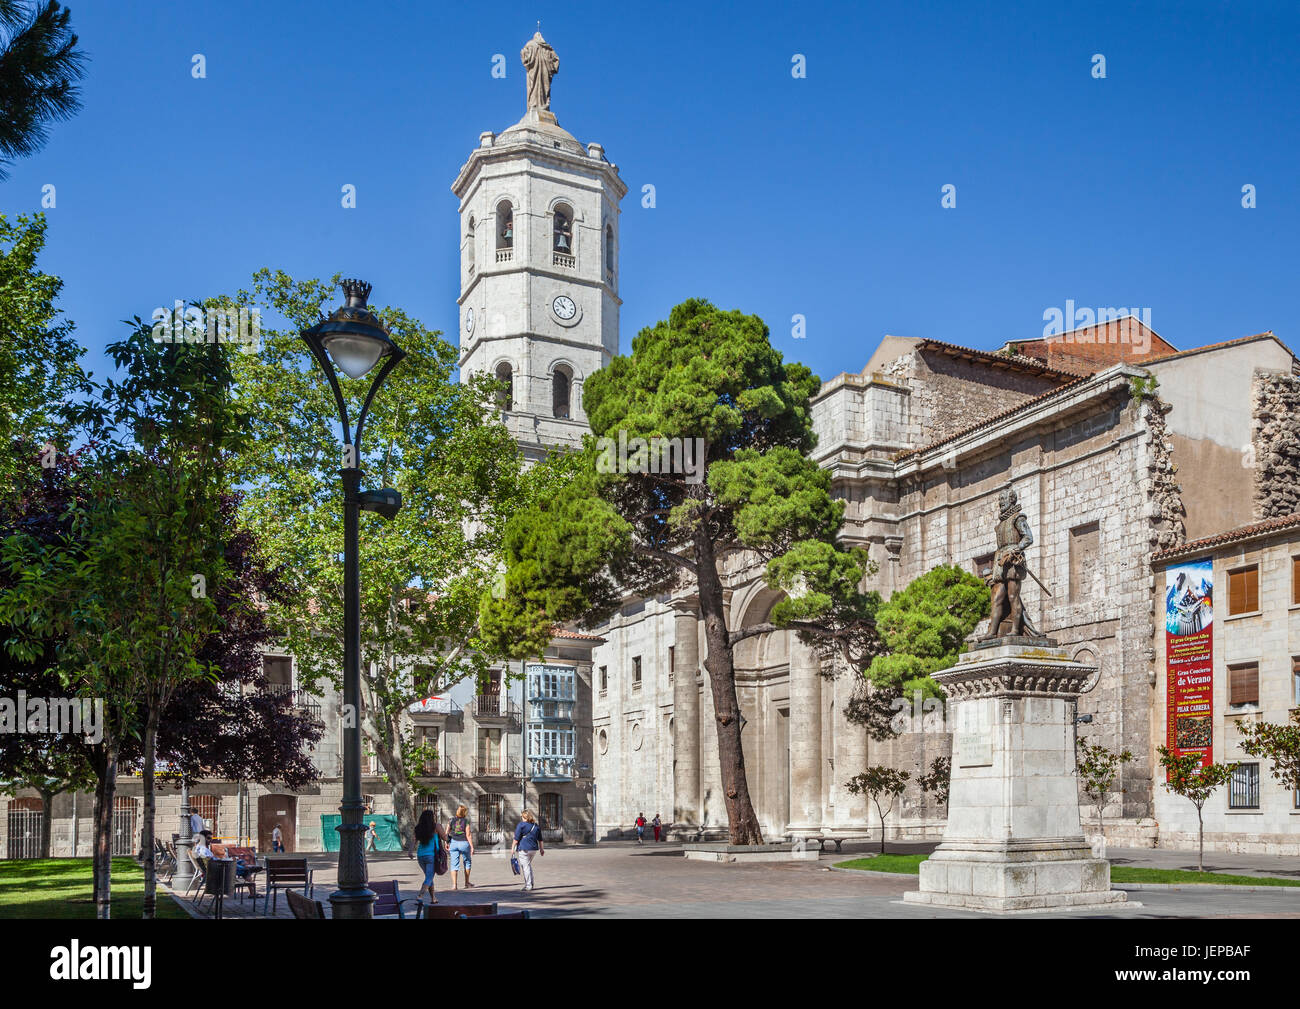 Spain, Castile and Leon, Valladolid, Plaza de la Universidad with Cervantes memorial und view of the unfinished - Stock Image